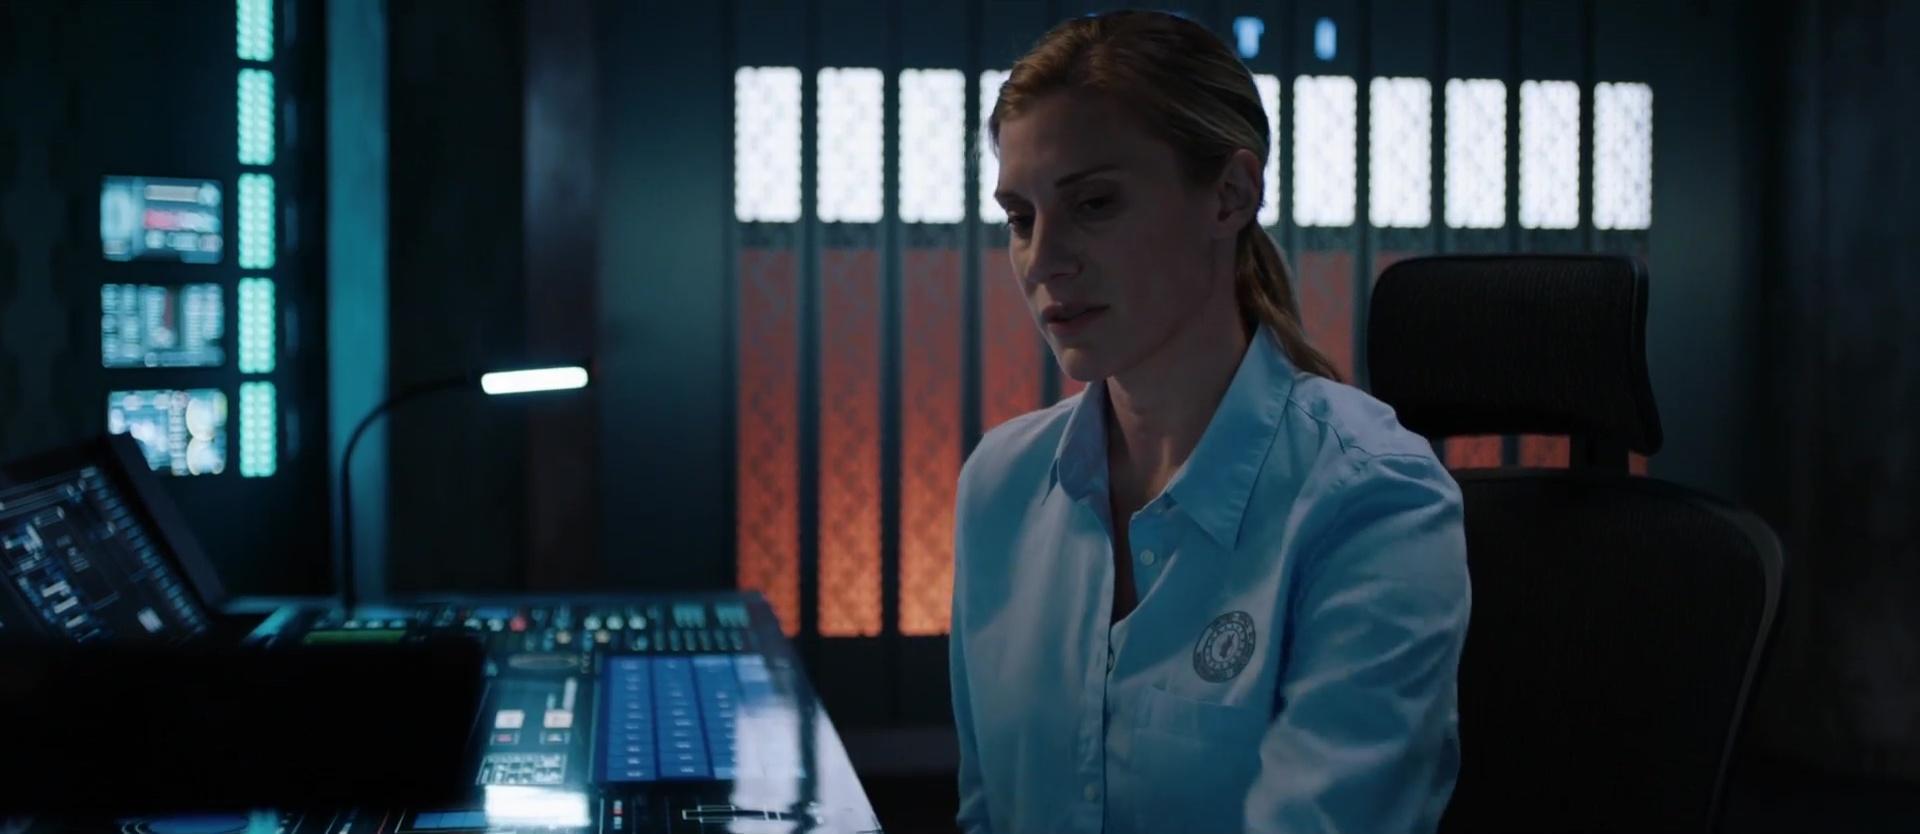 Film] 2036 Origin Unknown, de Hasraf Dulull (2018) - Dark